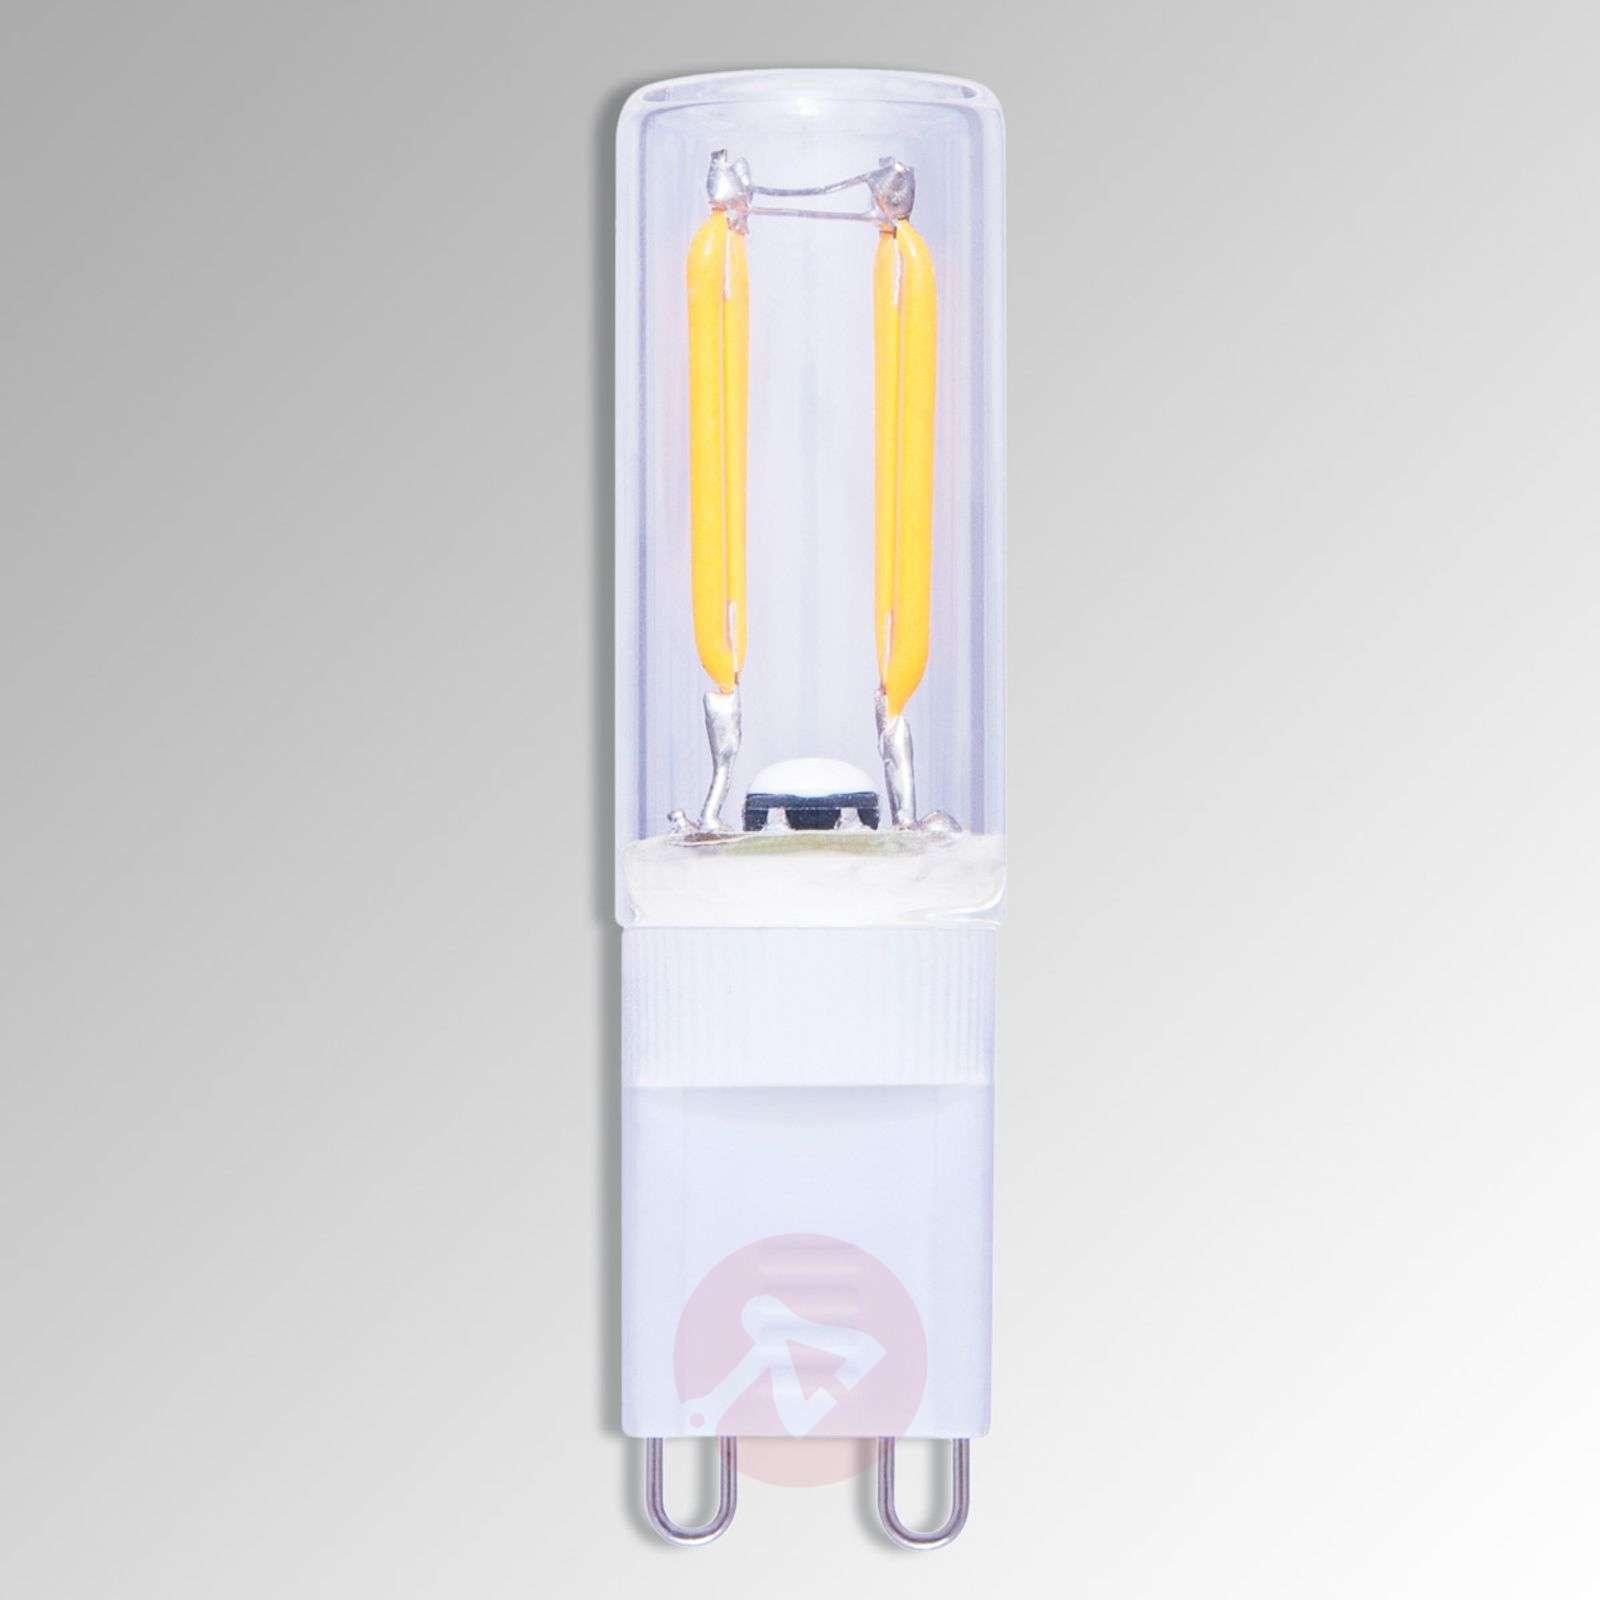 LED-nastakantalamppu G9 1,5W 822 hiililangalla-8536100-01